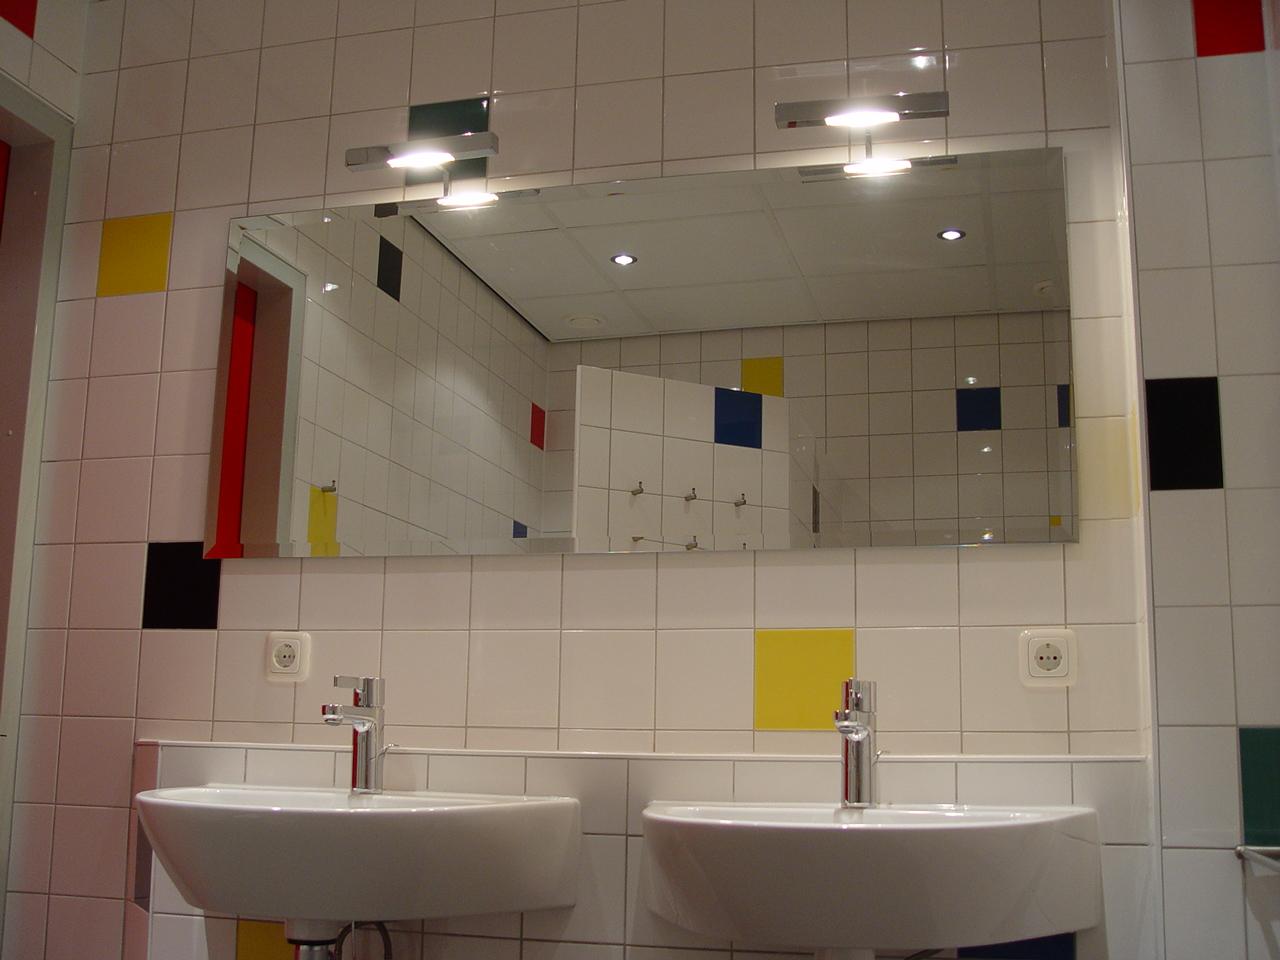 Sanitair En Tegels : Dingjan en zns sanitair tegels in westerland startpagina voor